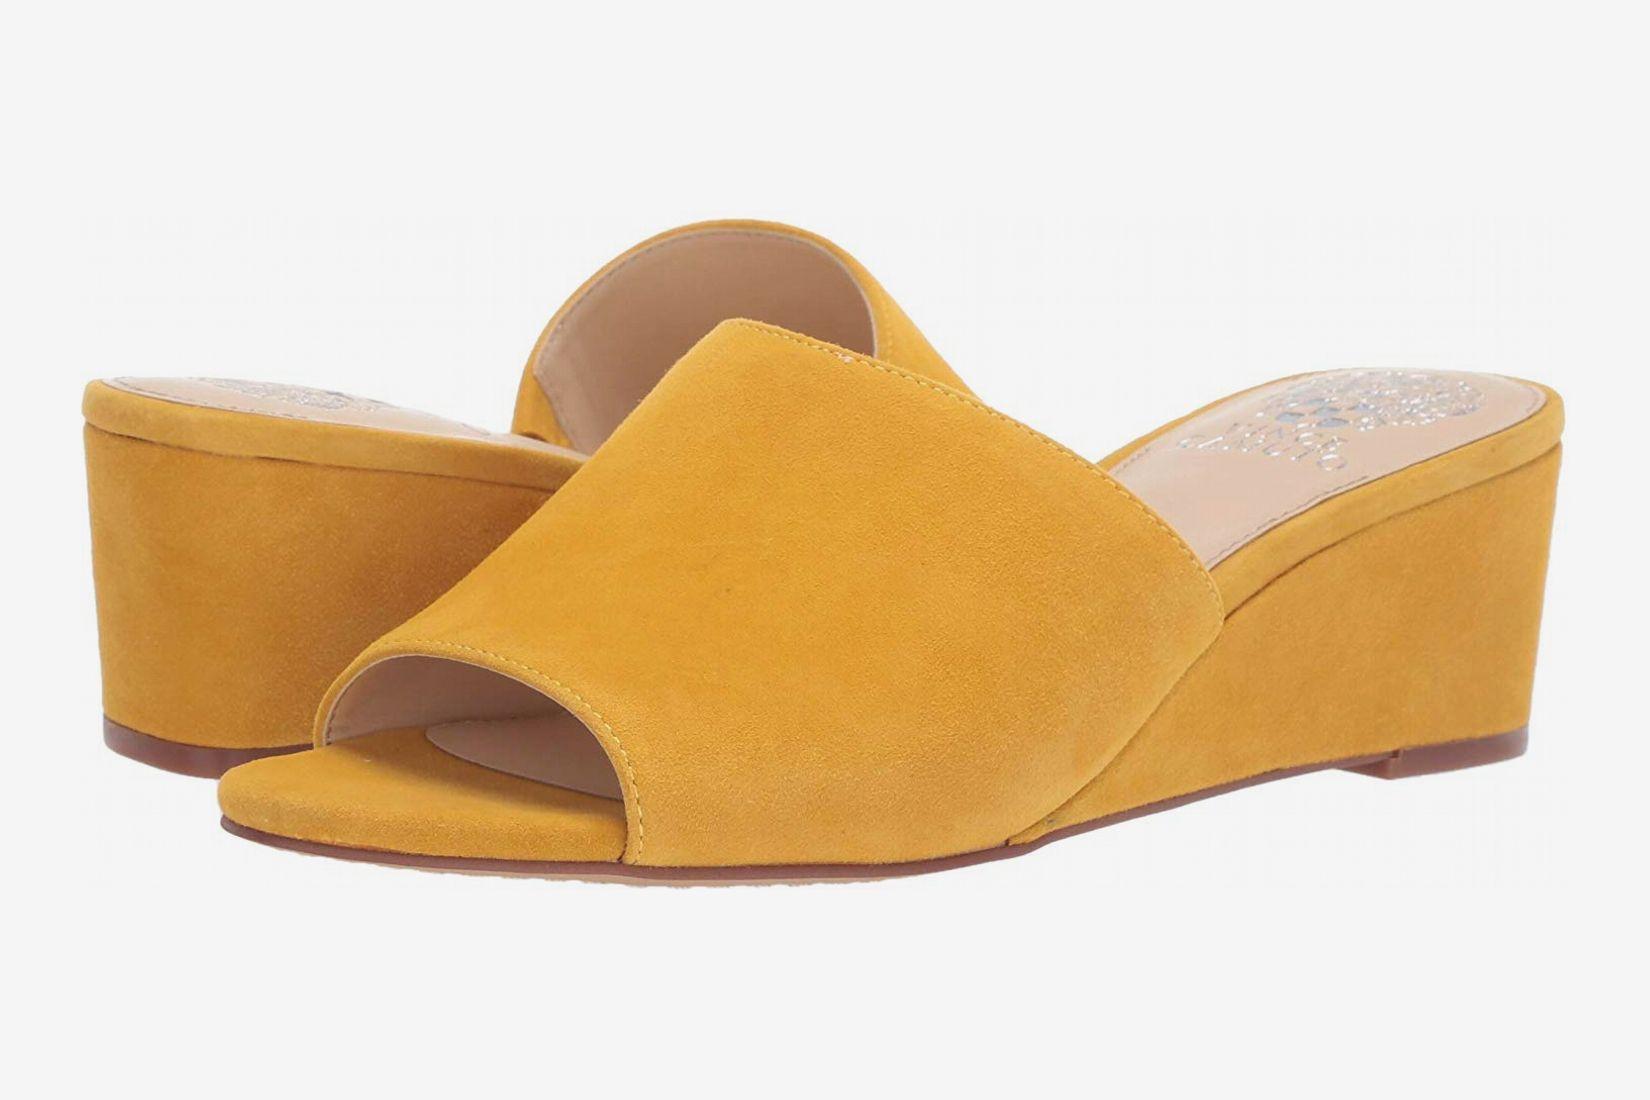 Vince Camuto Women's Stephena Wedge Sandal